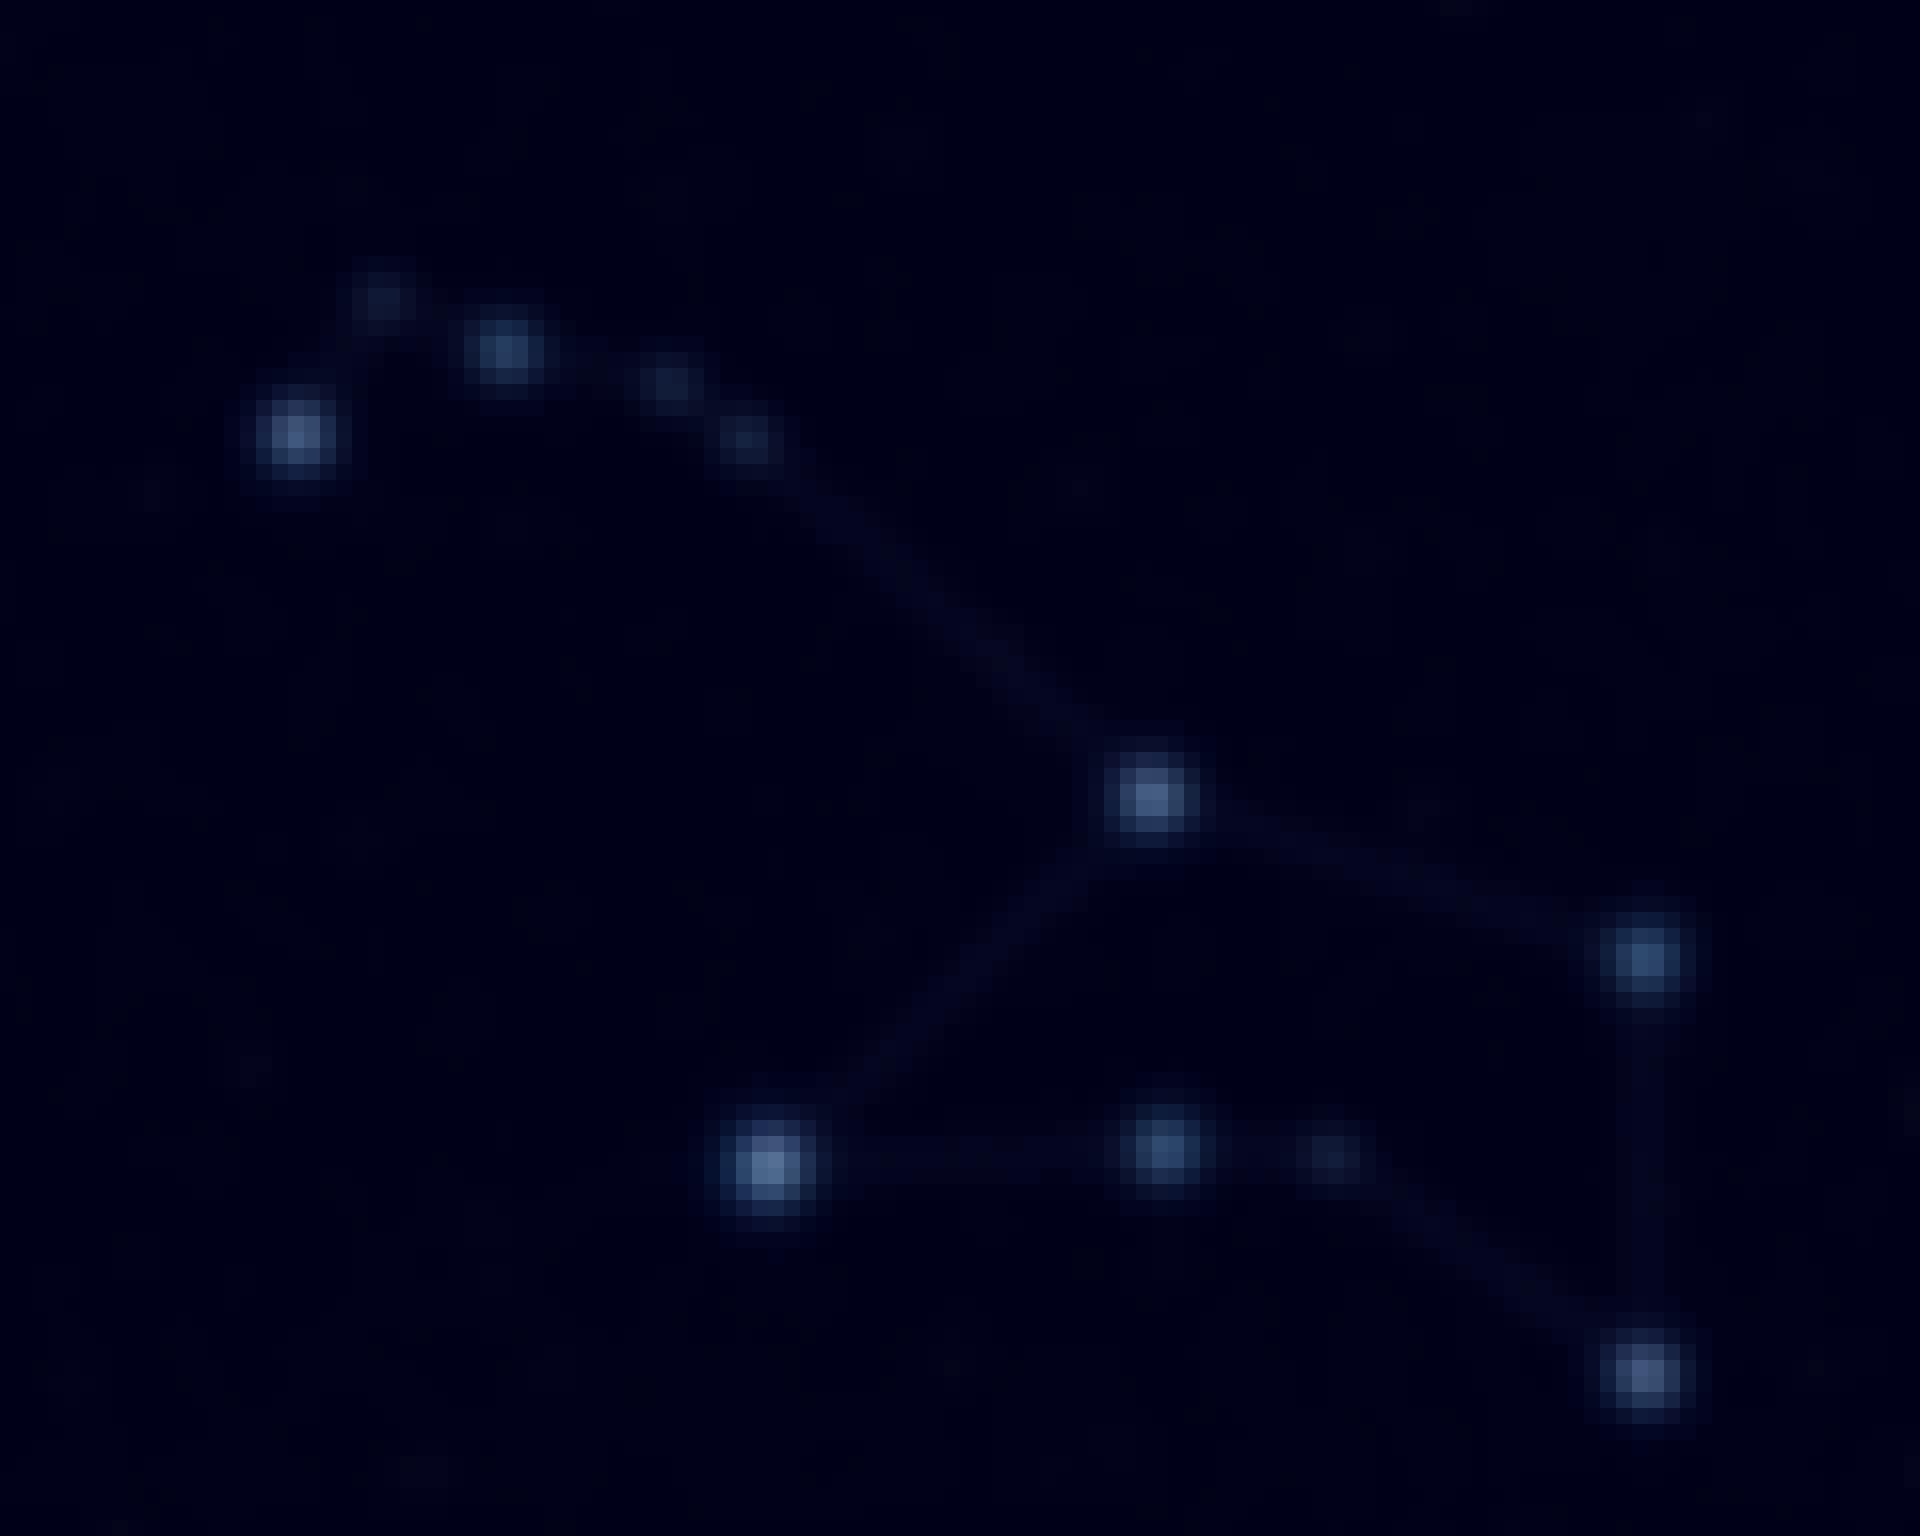 Stjernebilledet Agterstavnen